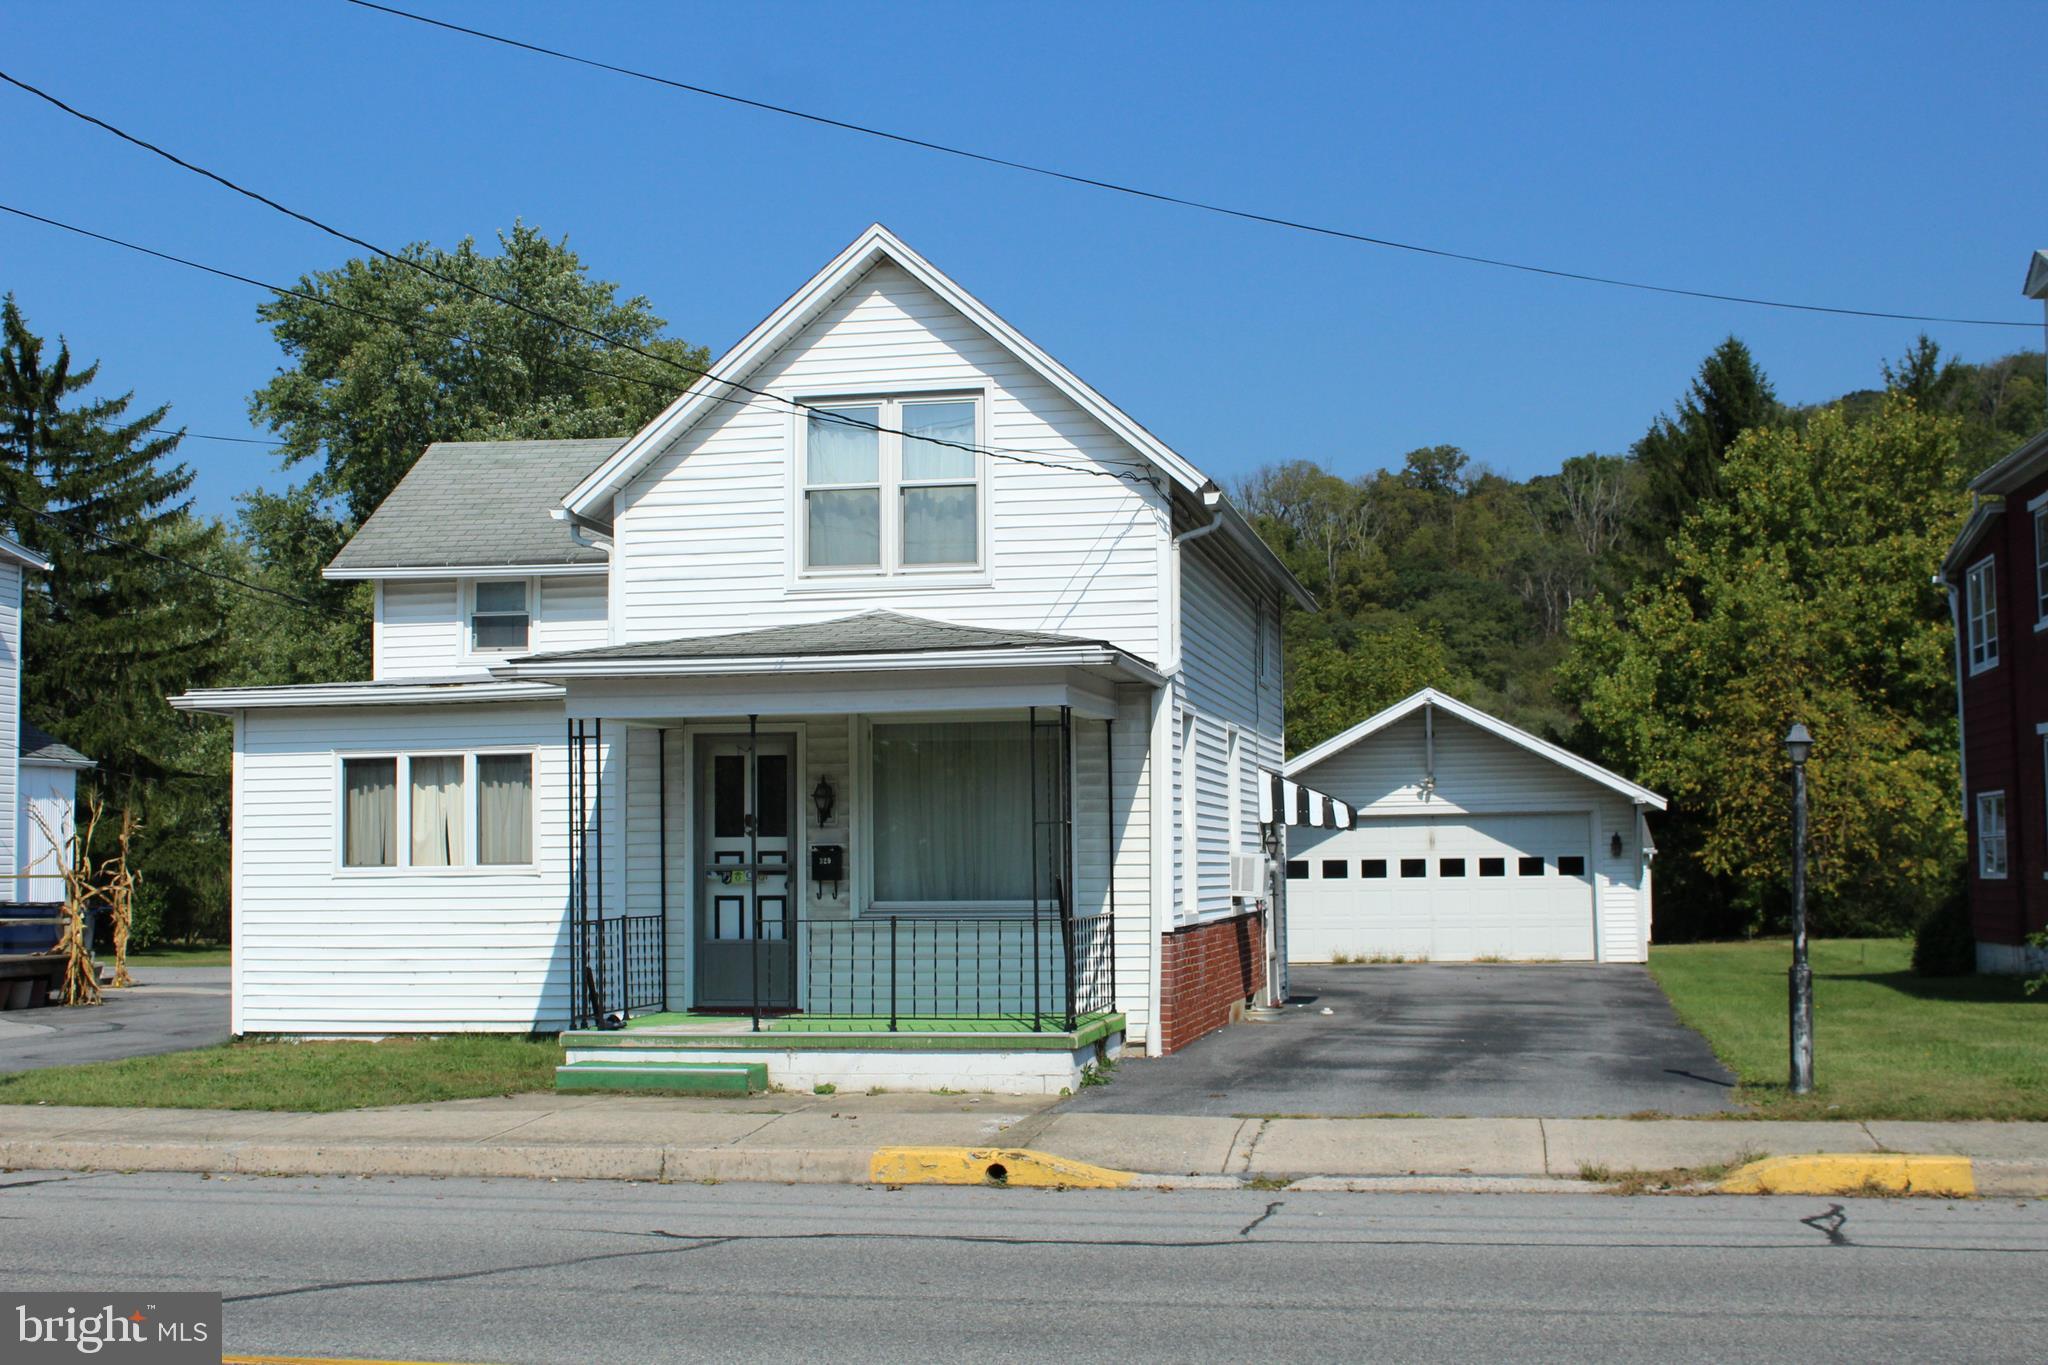 329 PITT STREET E, BEDFORD, PA 15522